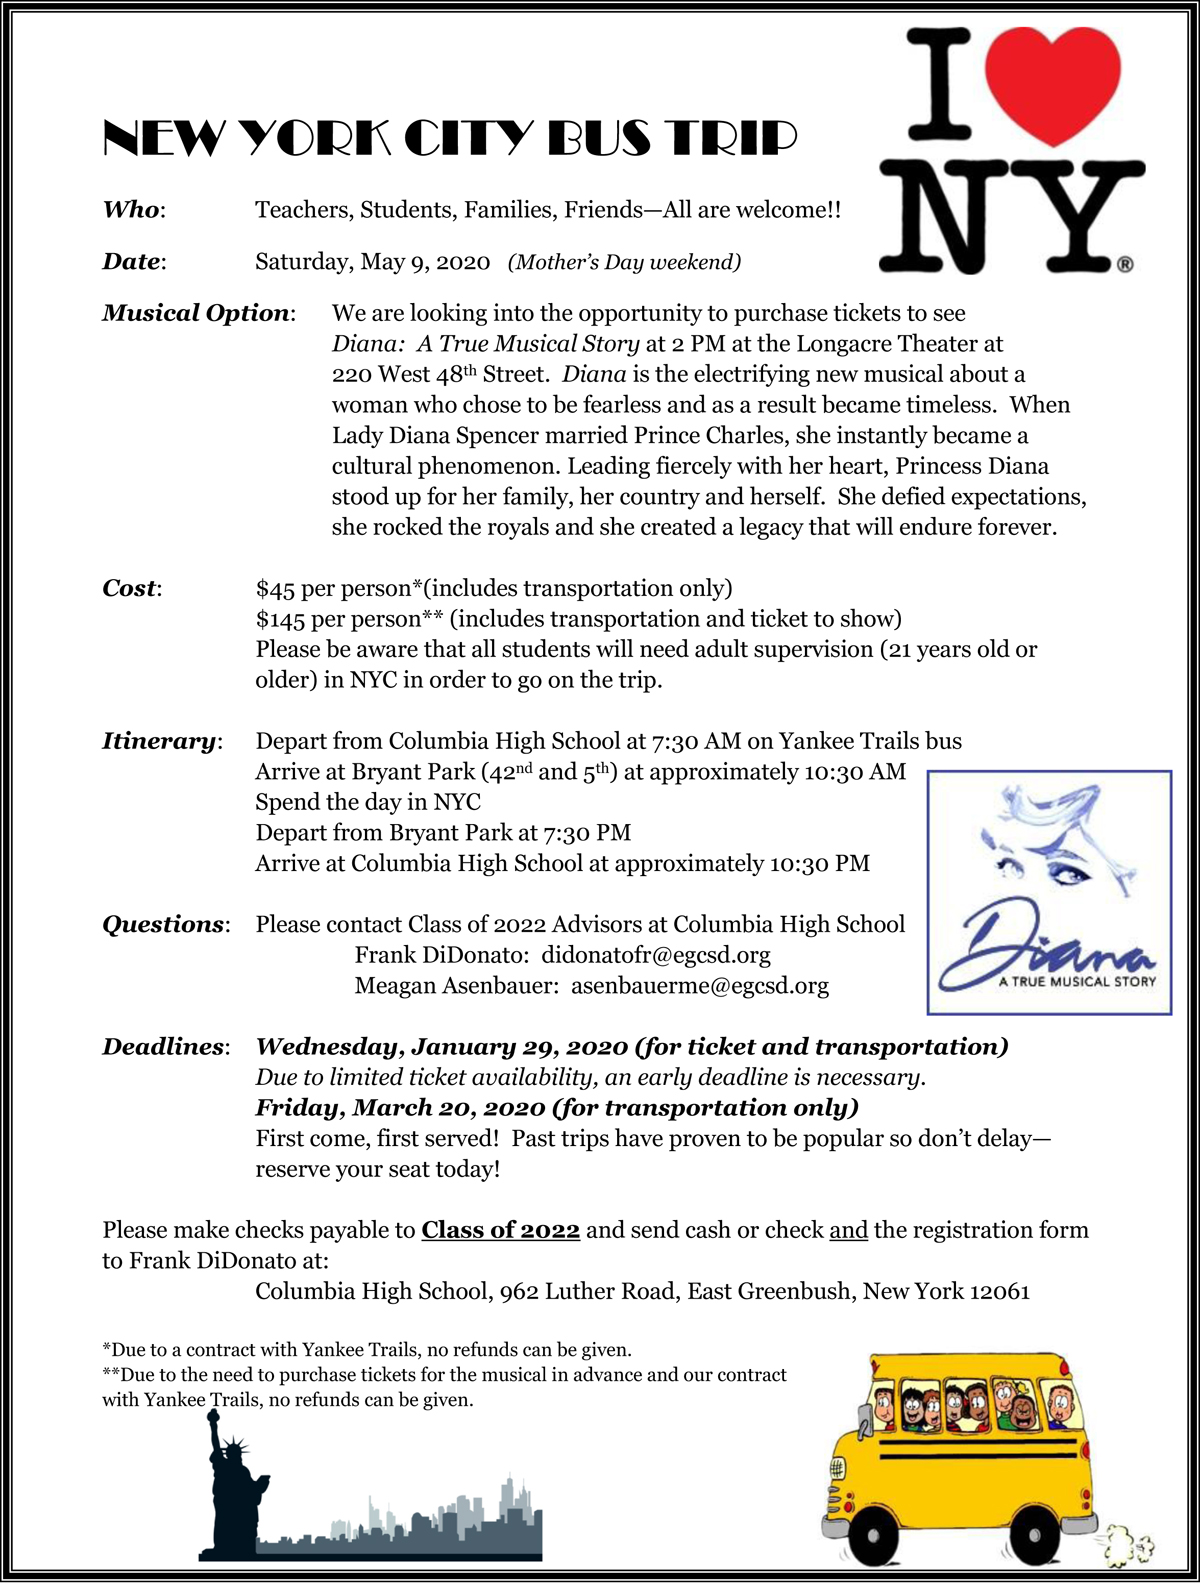 NYC bus trip registration form